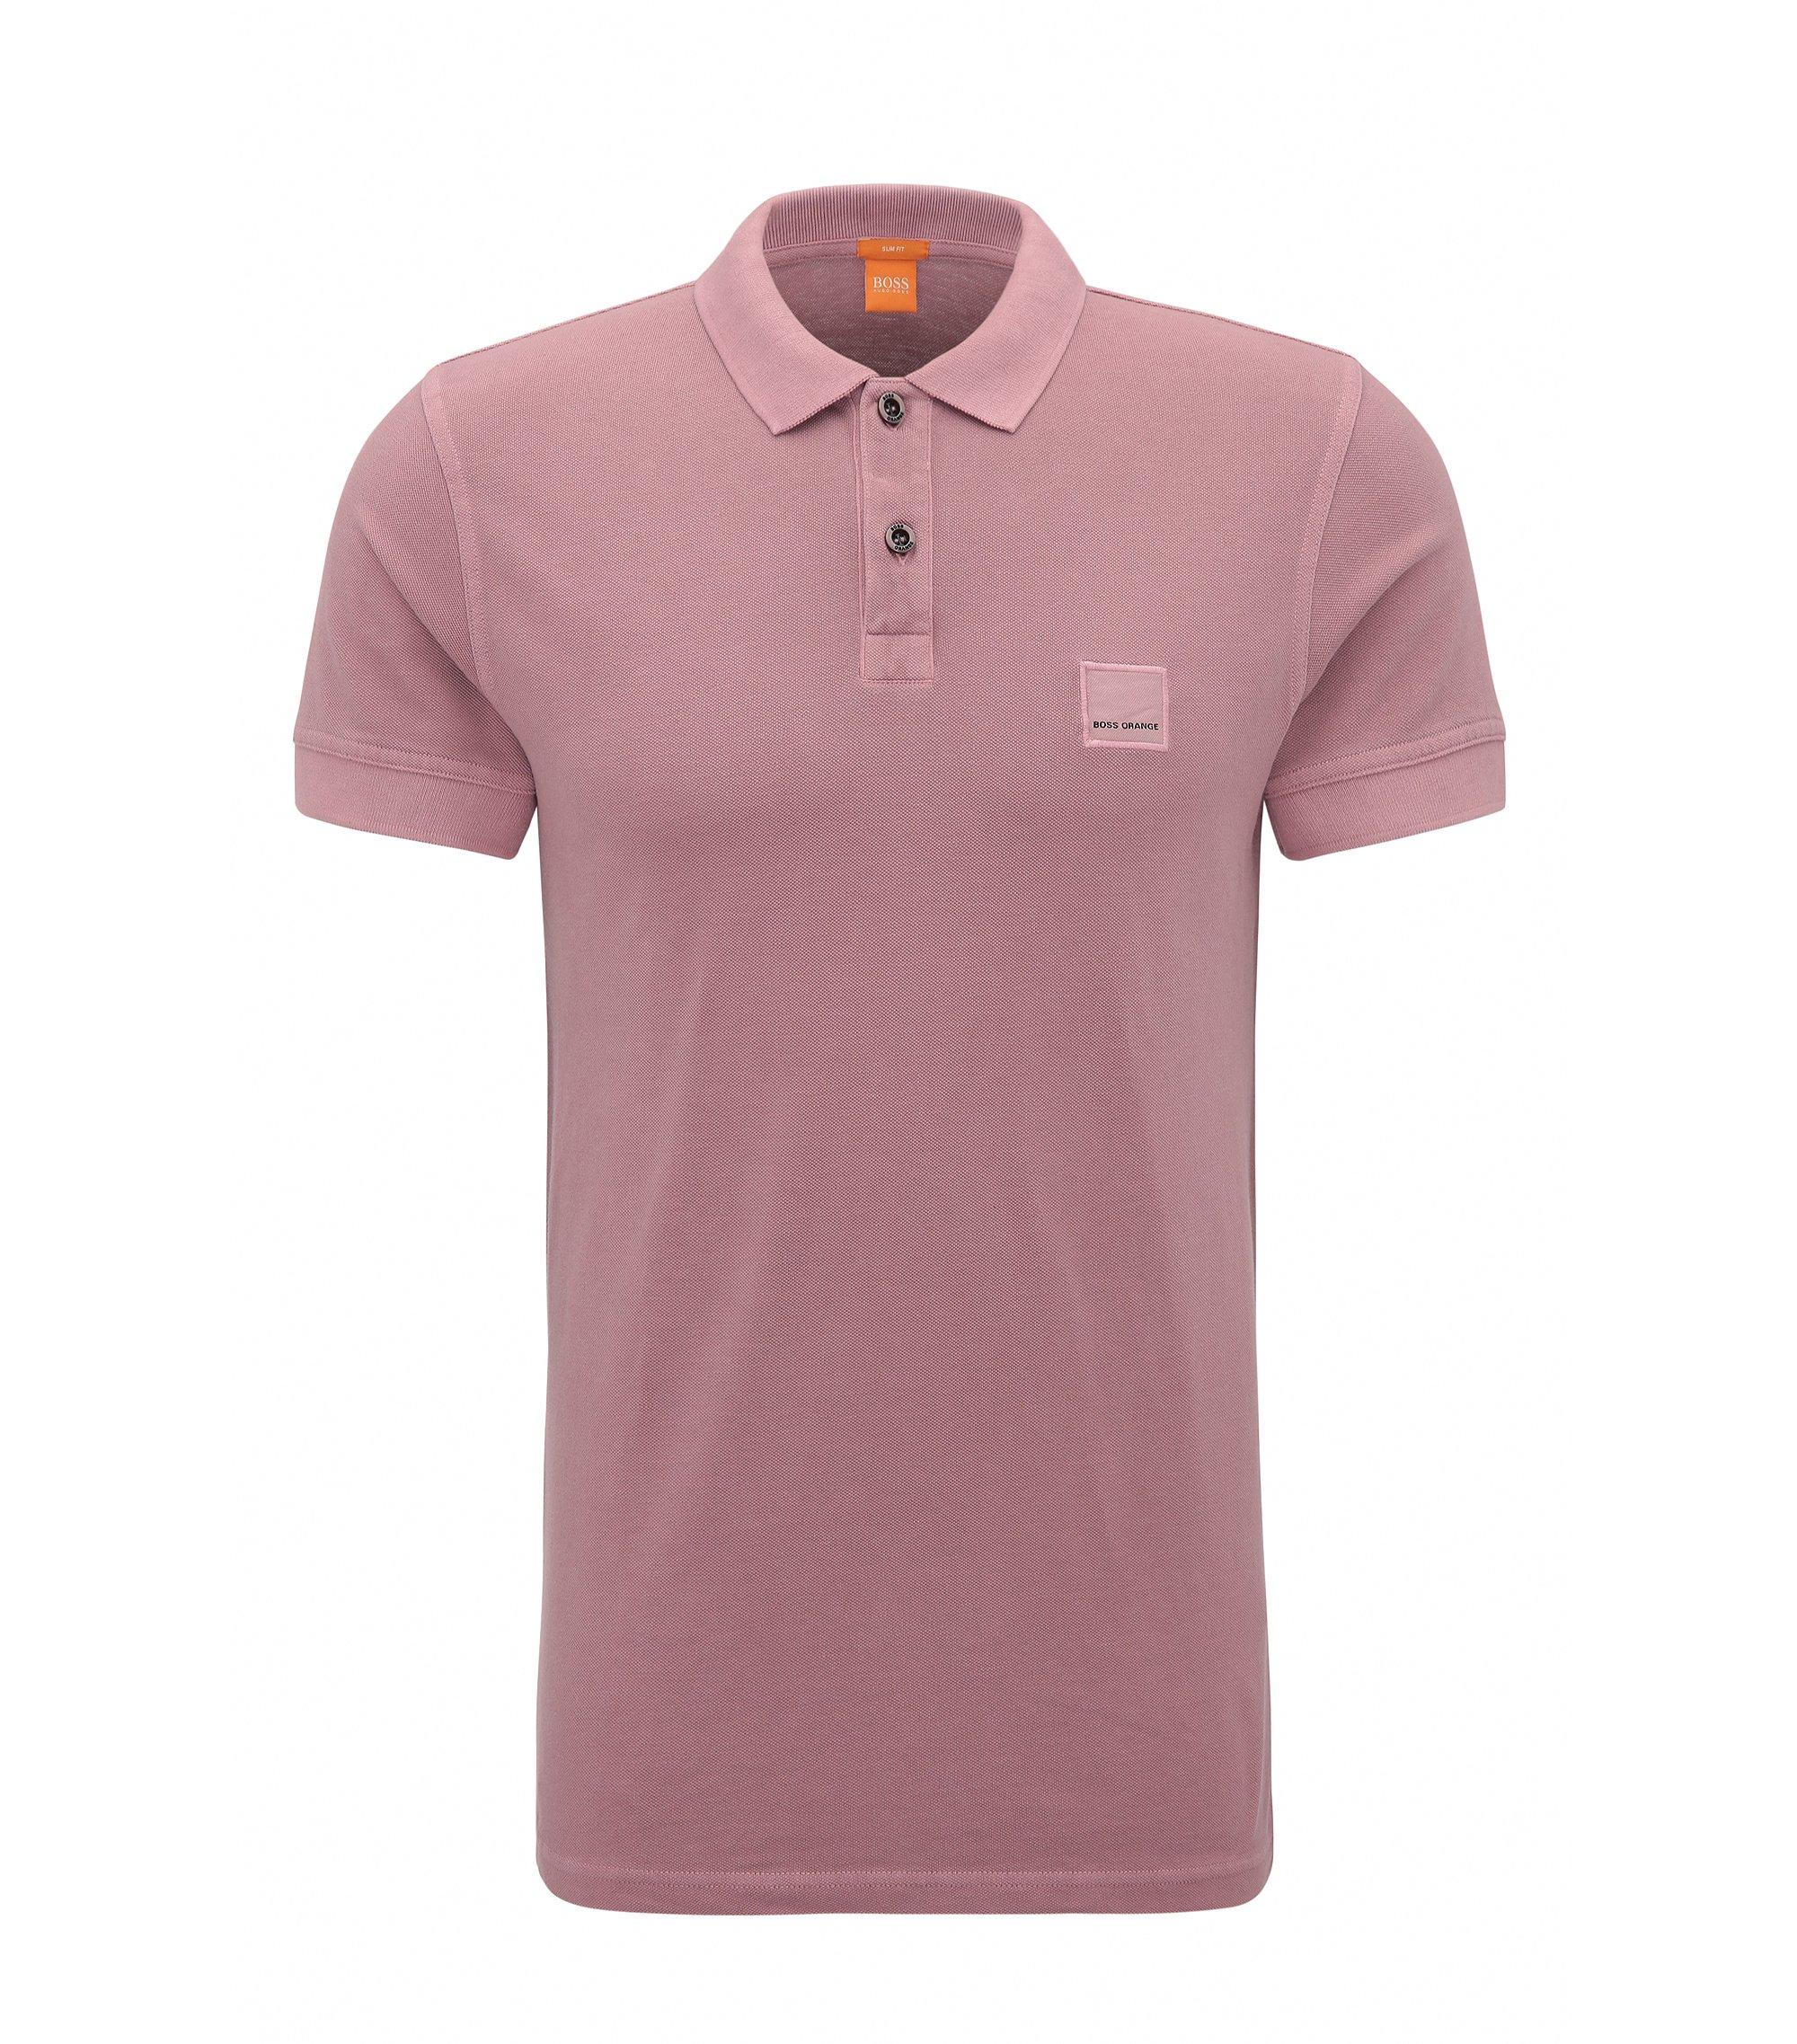 Cotton Polo Shirt, Slim Fit | Pascha, light pink